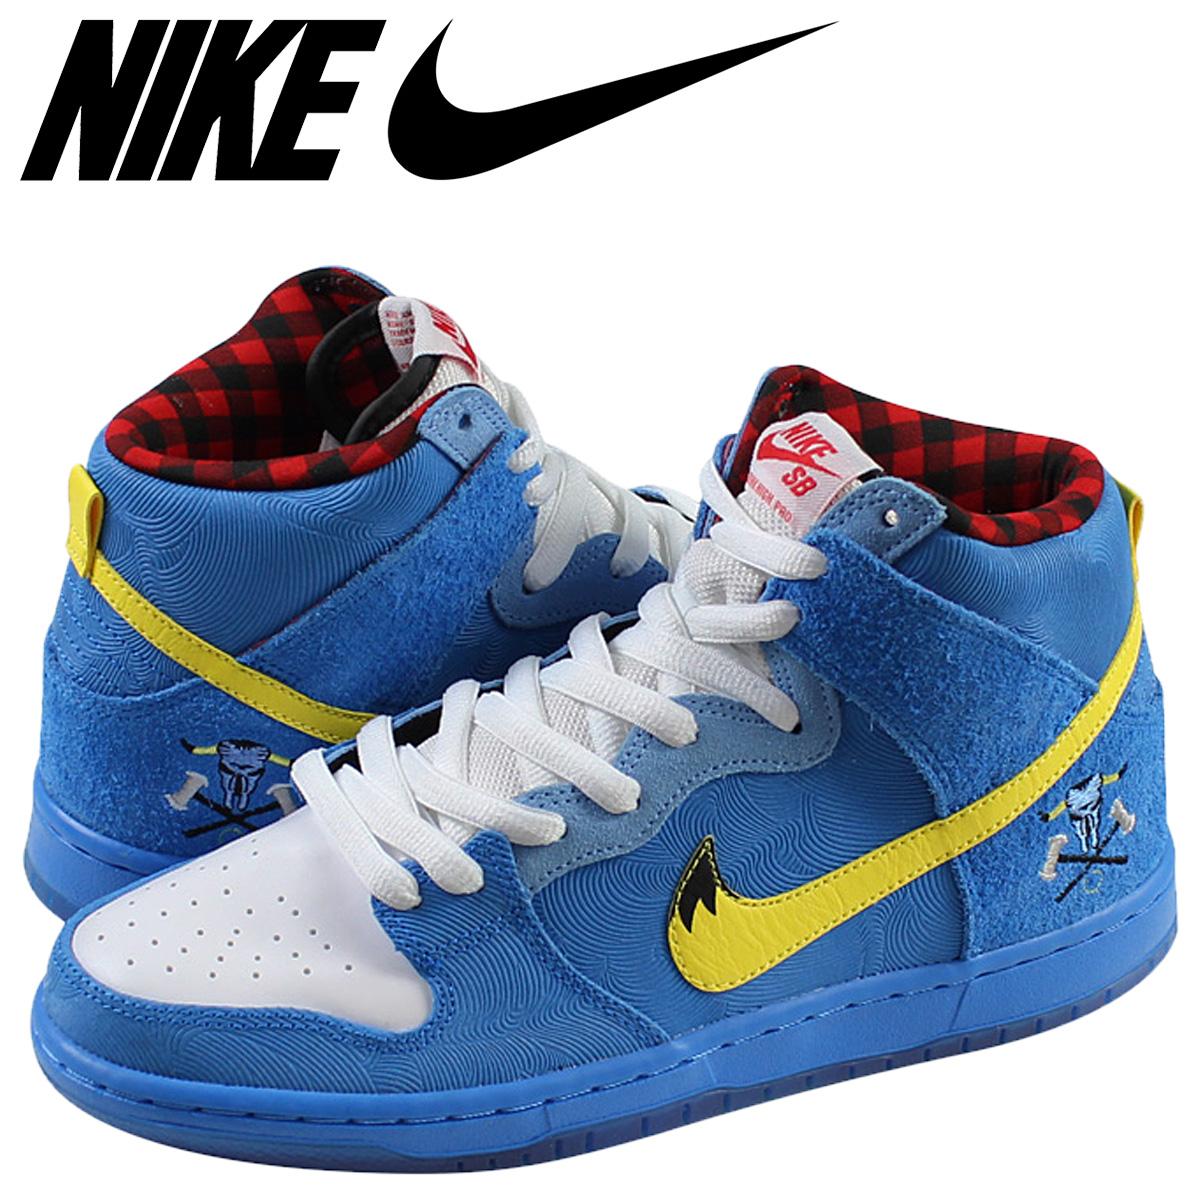 d1d2d718a85f ALLSPORTS  Nike NIKE dunk sneakers DUNK HIGH PREMIUM SB FAMILIA dunk ...